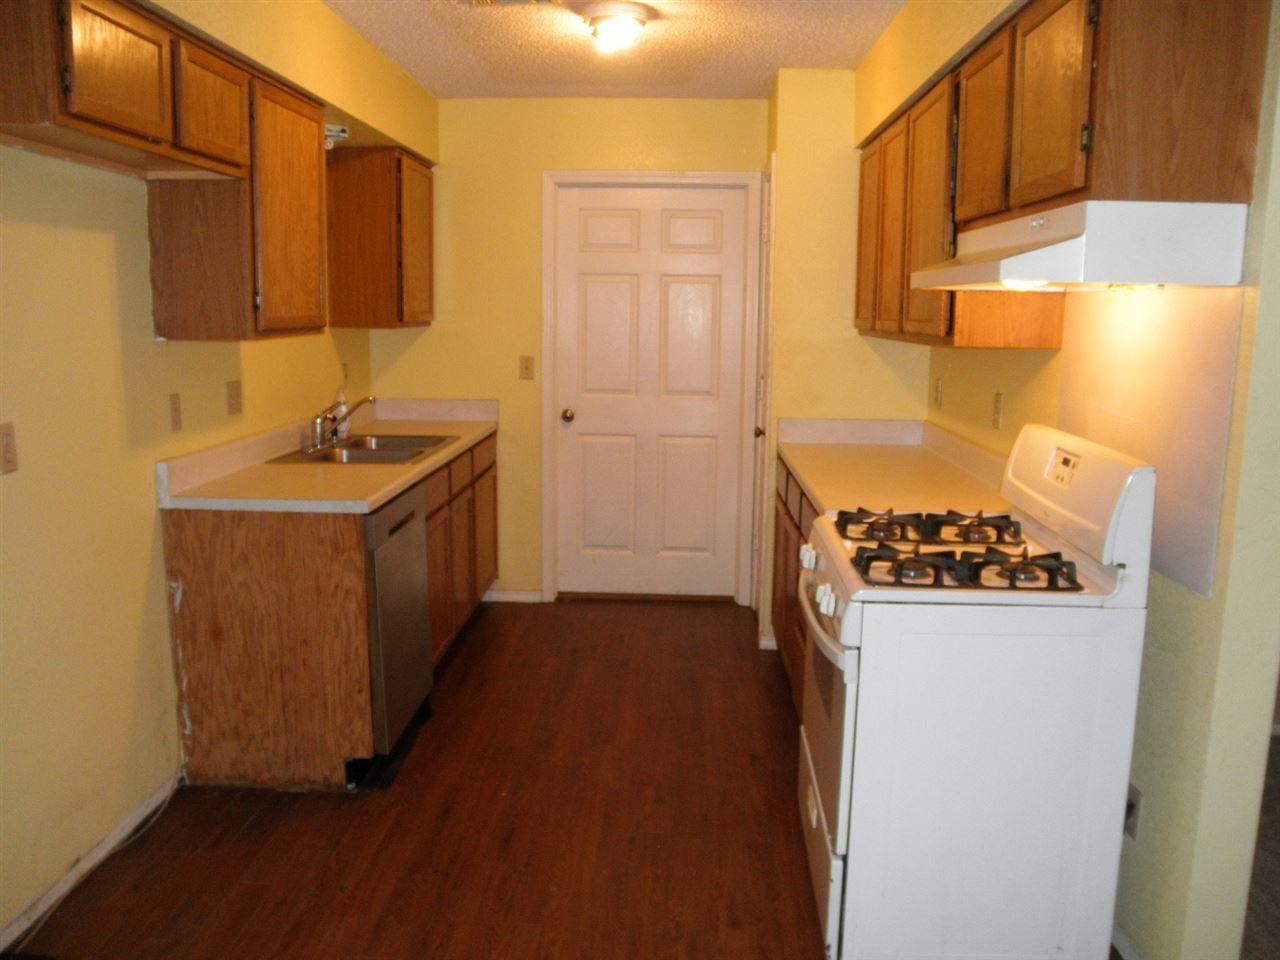 Sold Cross Sale W/ MLS | 118 Spruce  Kaw City, OK 74641 2